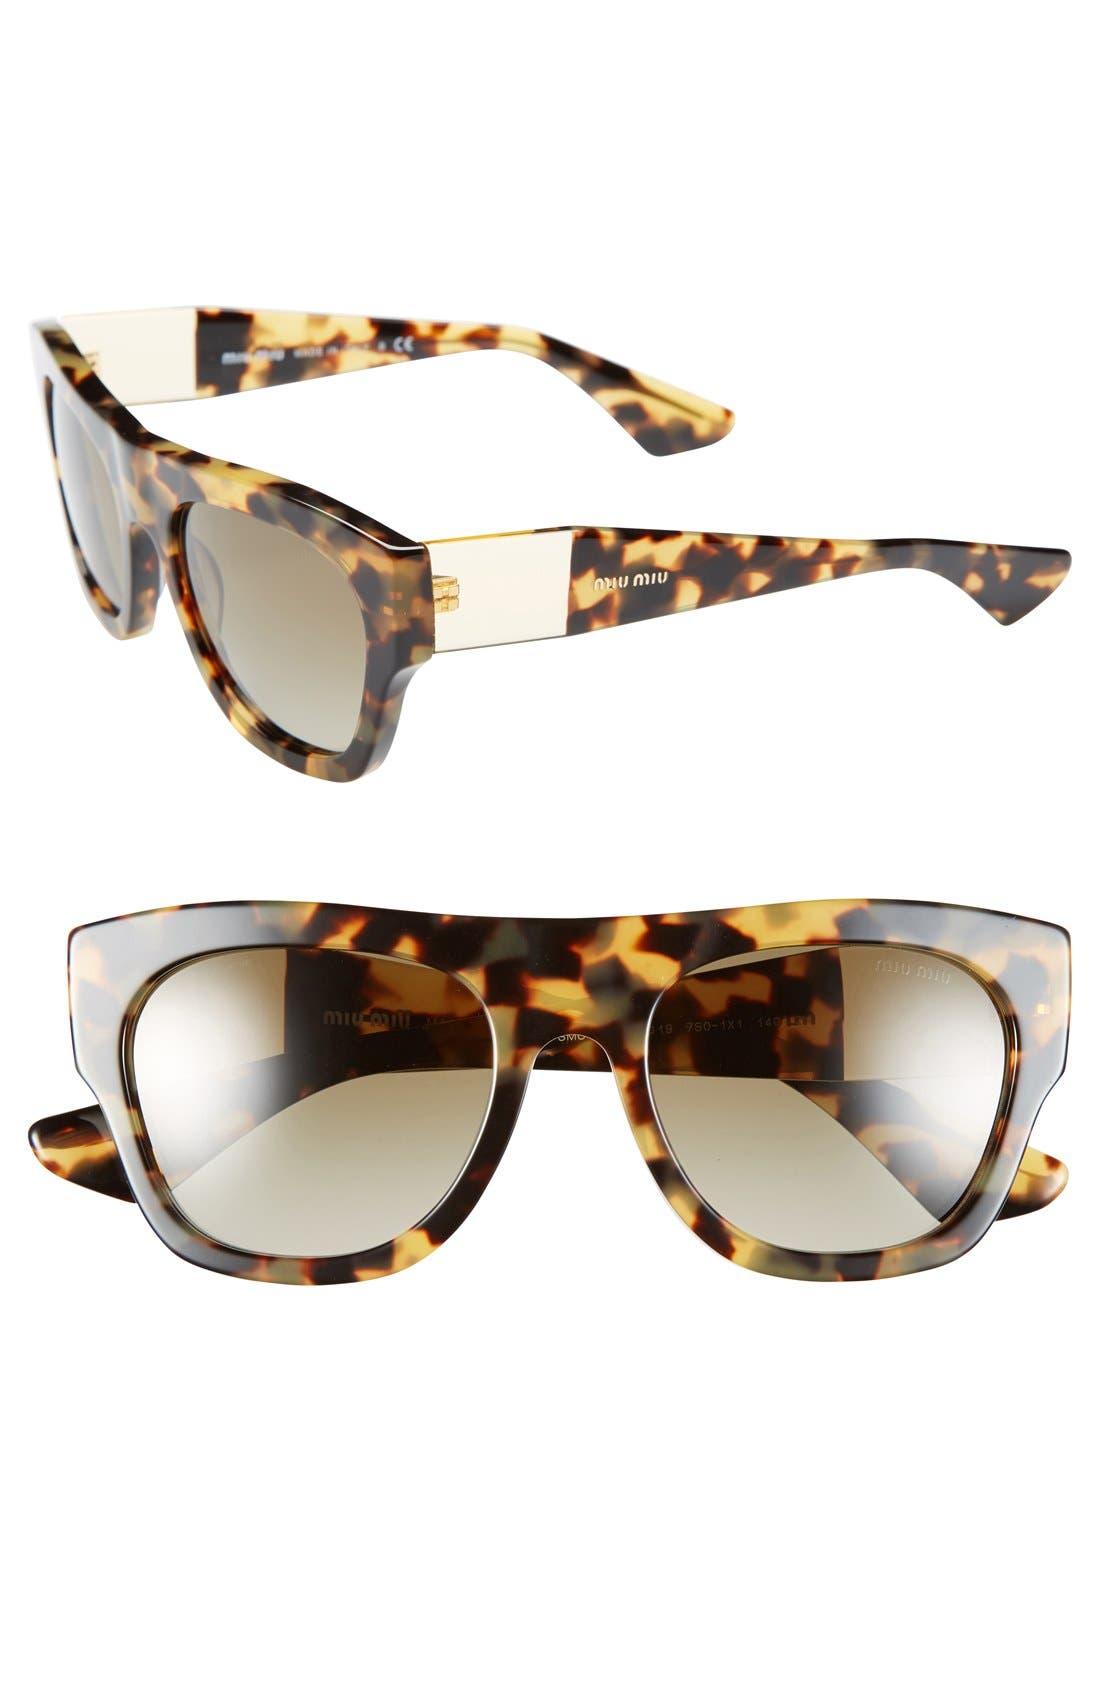 Main Image - Miu Miu 52mm Retro Sunglasses